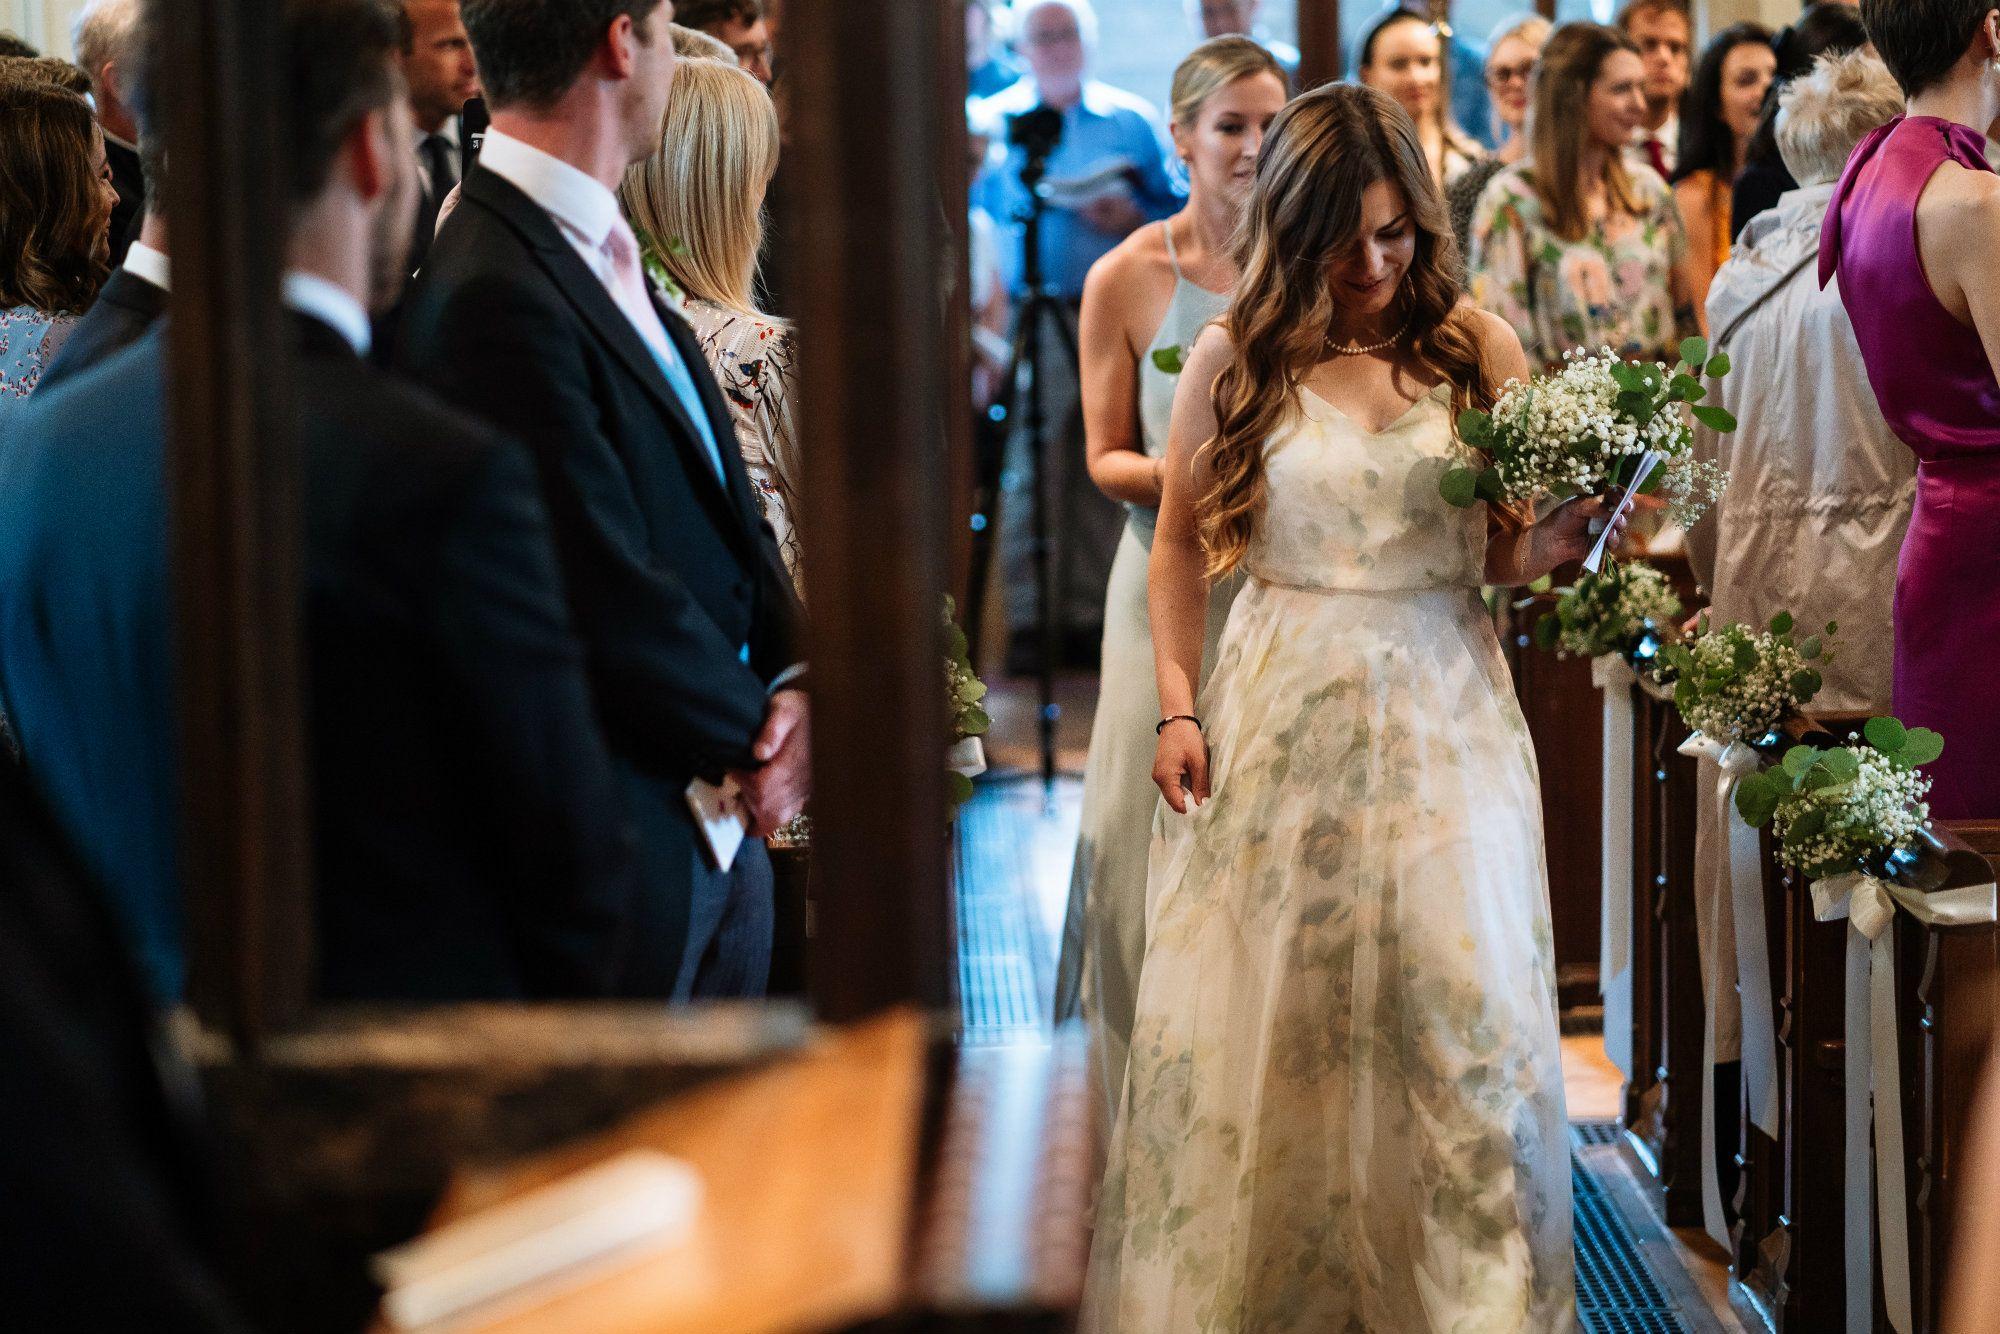 Cotswolds-bridal-&-wedding hair-stylist-Hiles house-Painswick-UK-KTHRYN19 (